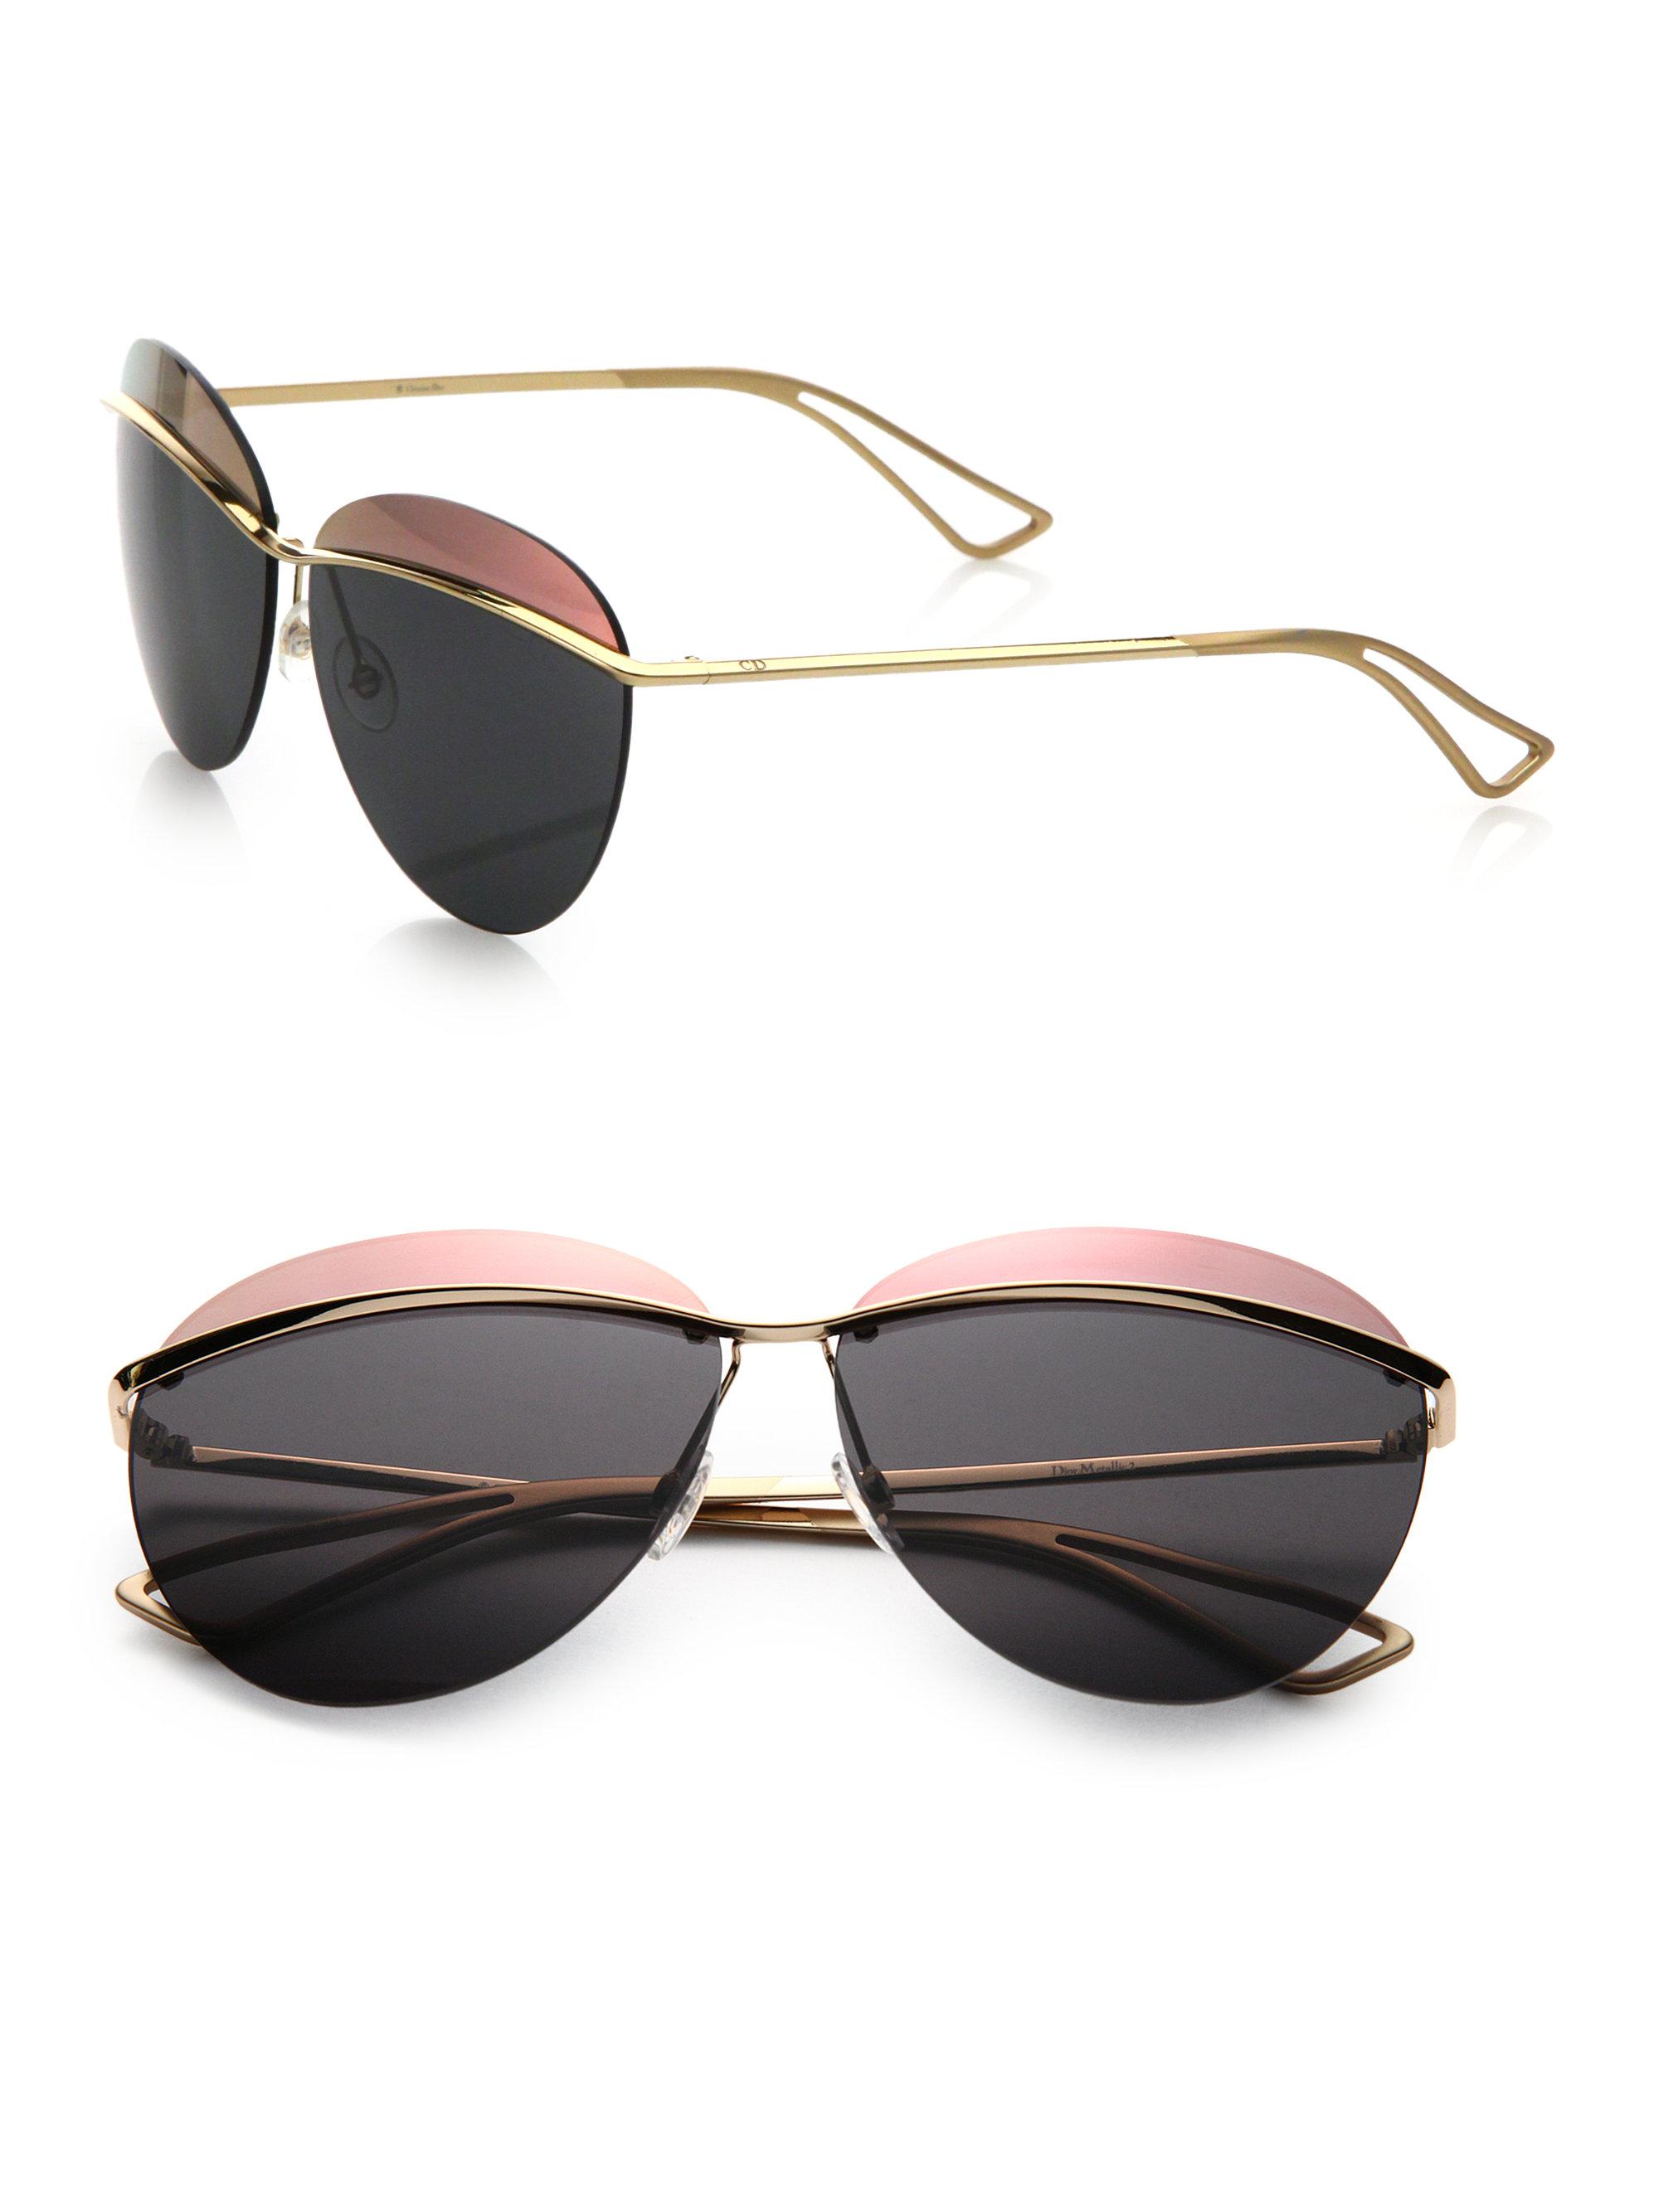 20884090625b6 ... dior sunglasses 2015